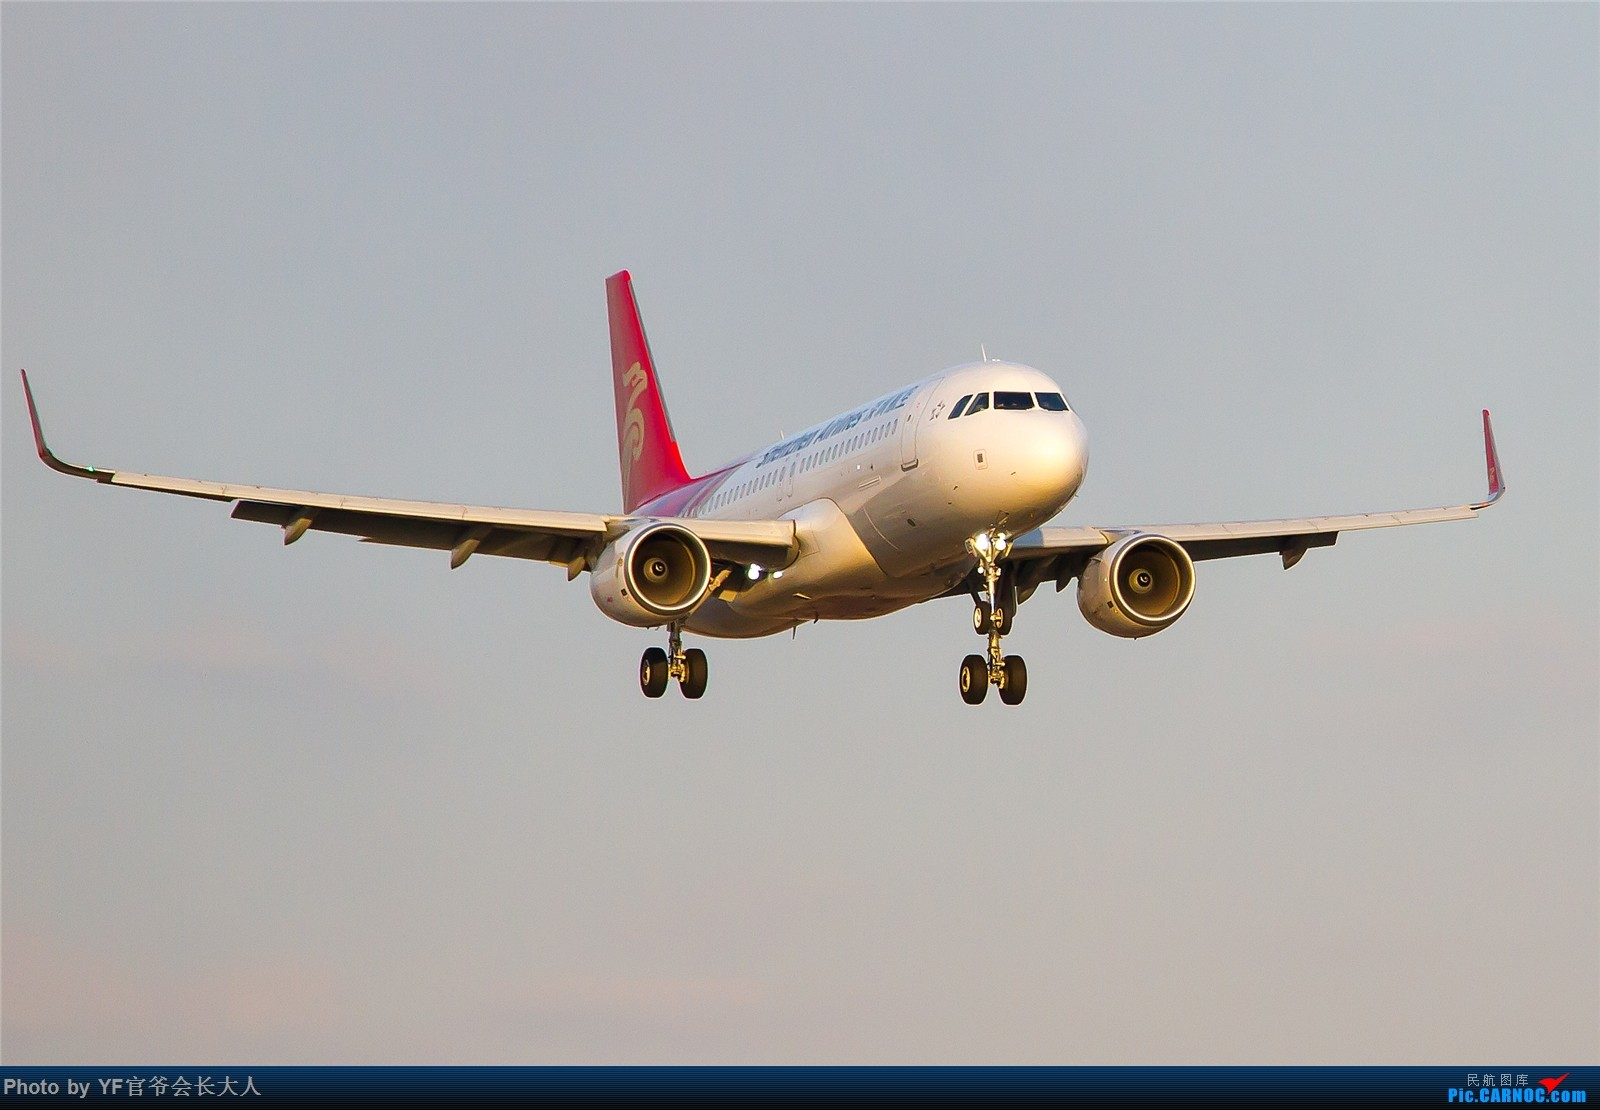 Re:[原创]【ZYTX】【1600*1066】论坛首发:俄罗斯艾菲航空公司波音757-28A,注册号:EI-EWT,还有757斯基以及最近新拍机点拍的一些好货 AIRBUS A320-200 B-1685 中国沈阳桃仙国际机场